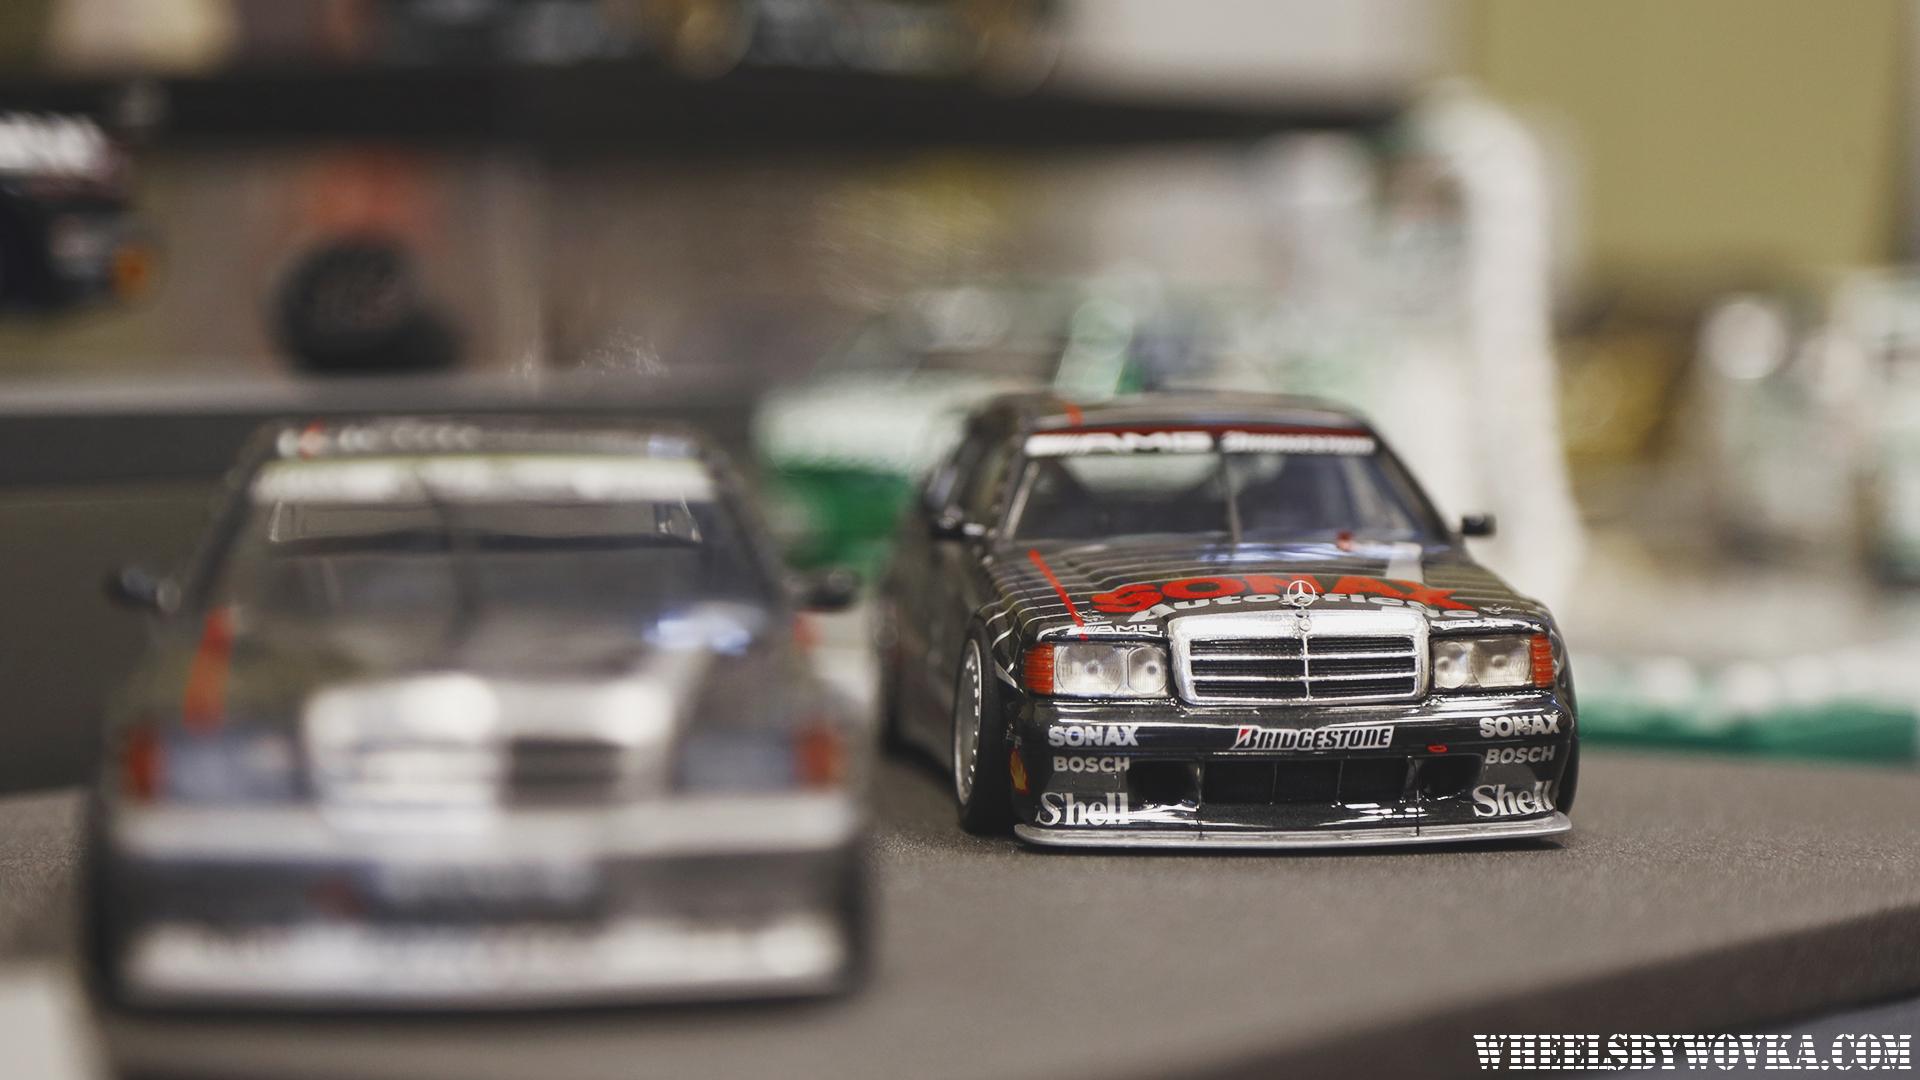 model-car-show-frankfurt-2017-11